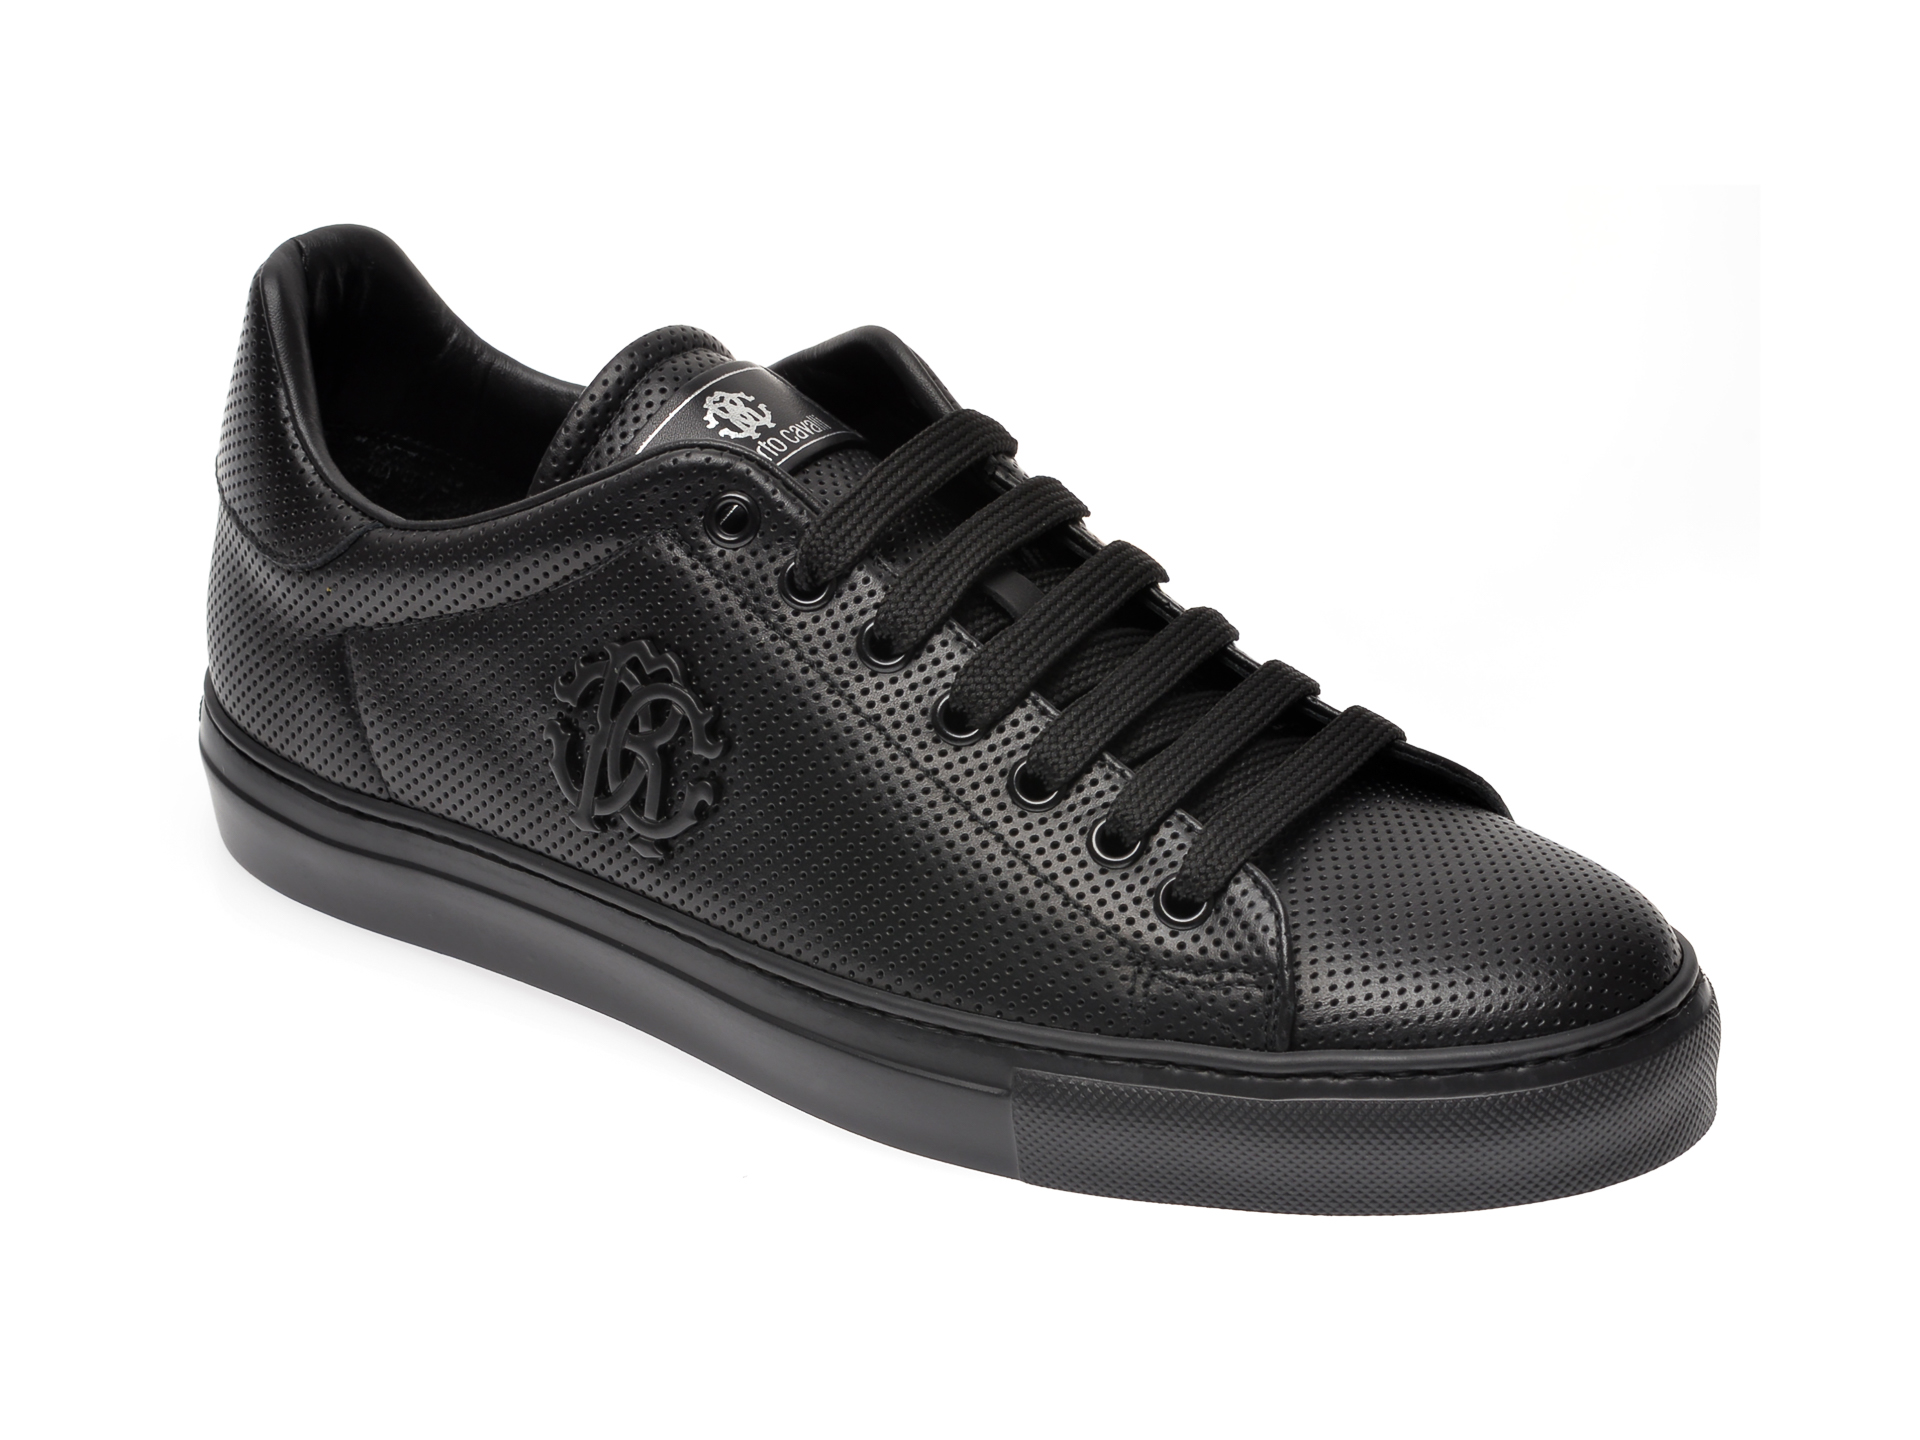 Pantofi ROBERTO CAVALLI negri, 1001, din piele naturala imagine